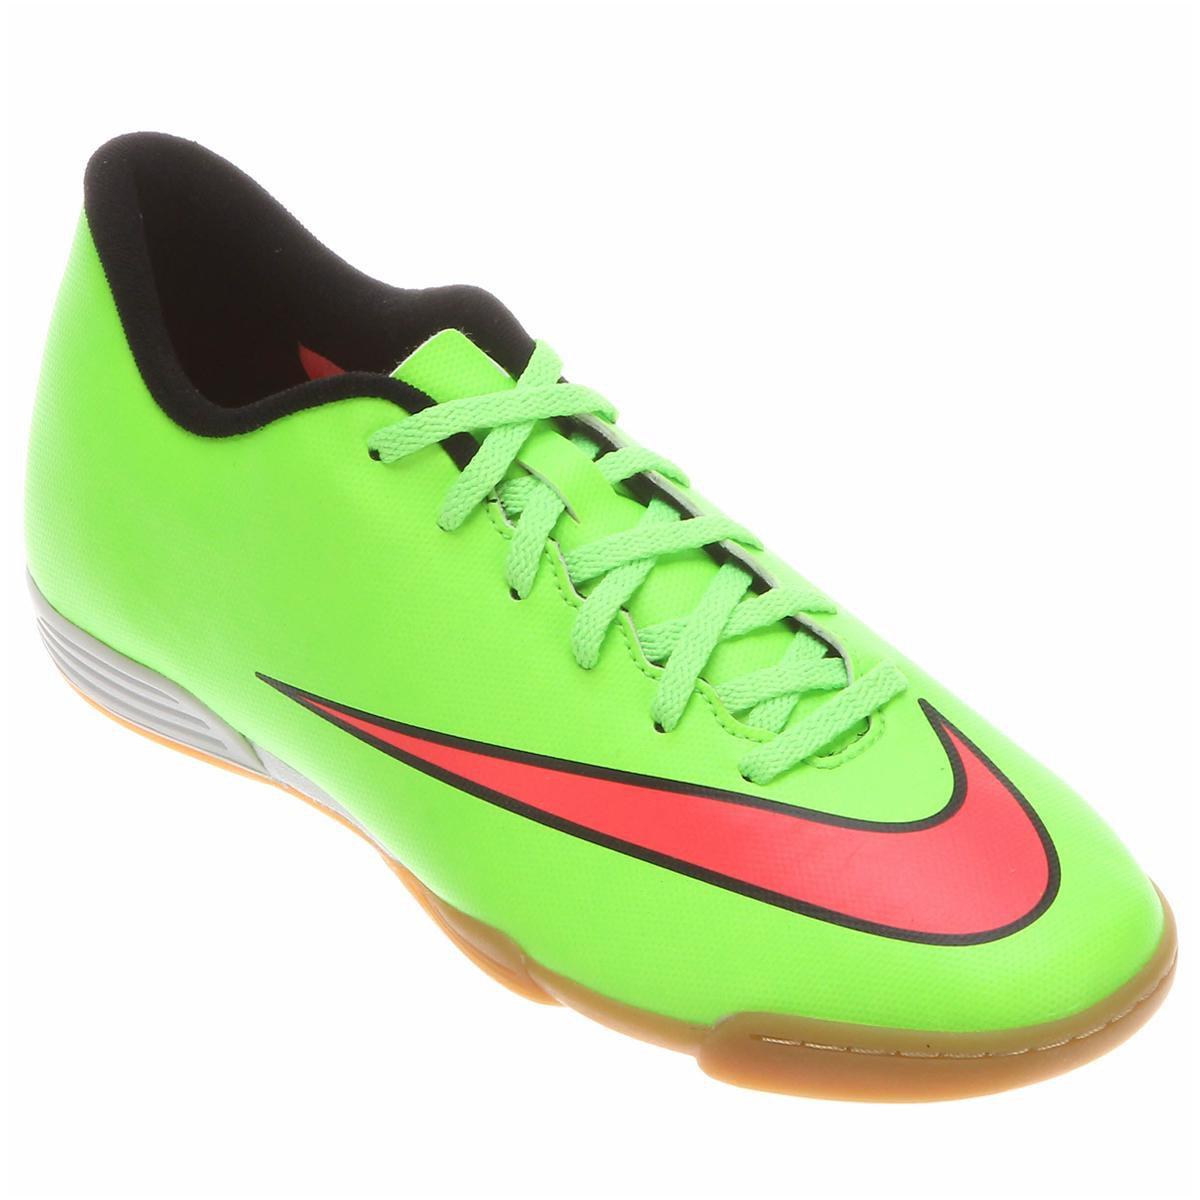 370c6b702a Chuteira Futsal Nike Mercurial Vortex 2 IC - Compre Agora